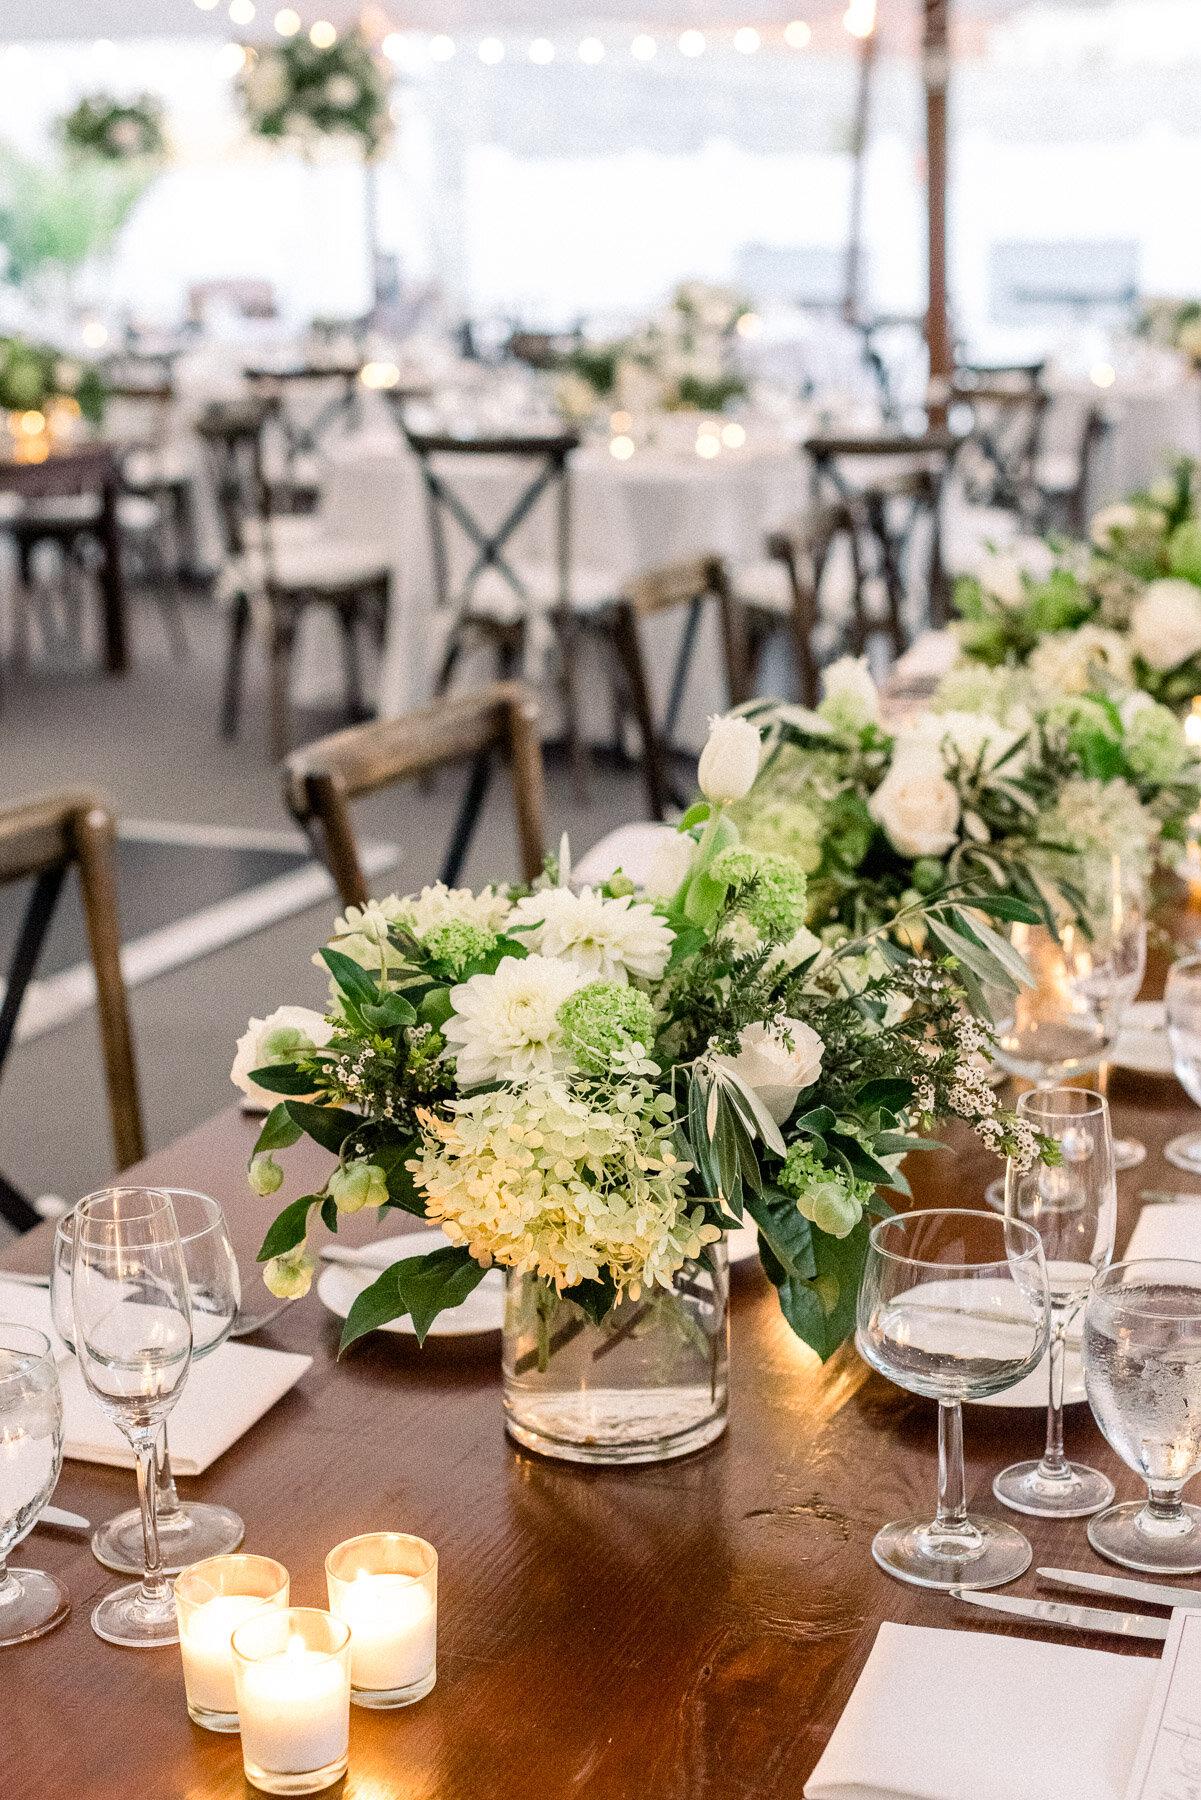 Adelphi Saratoga Wedding by Michelle Lange Photography-46.jpg